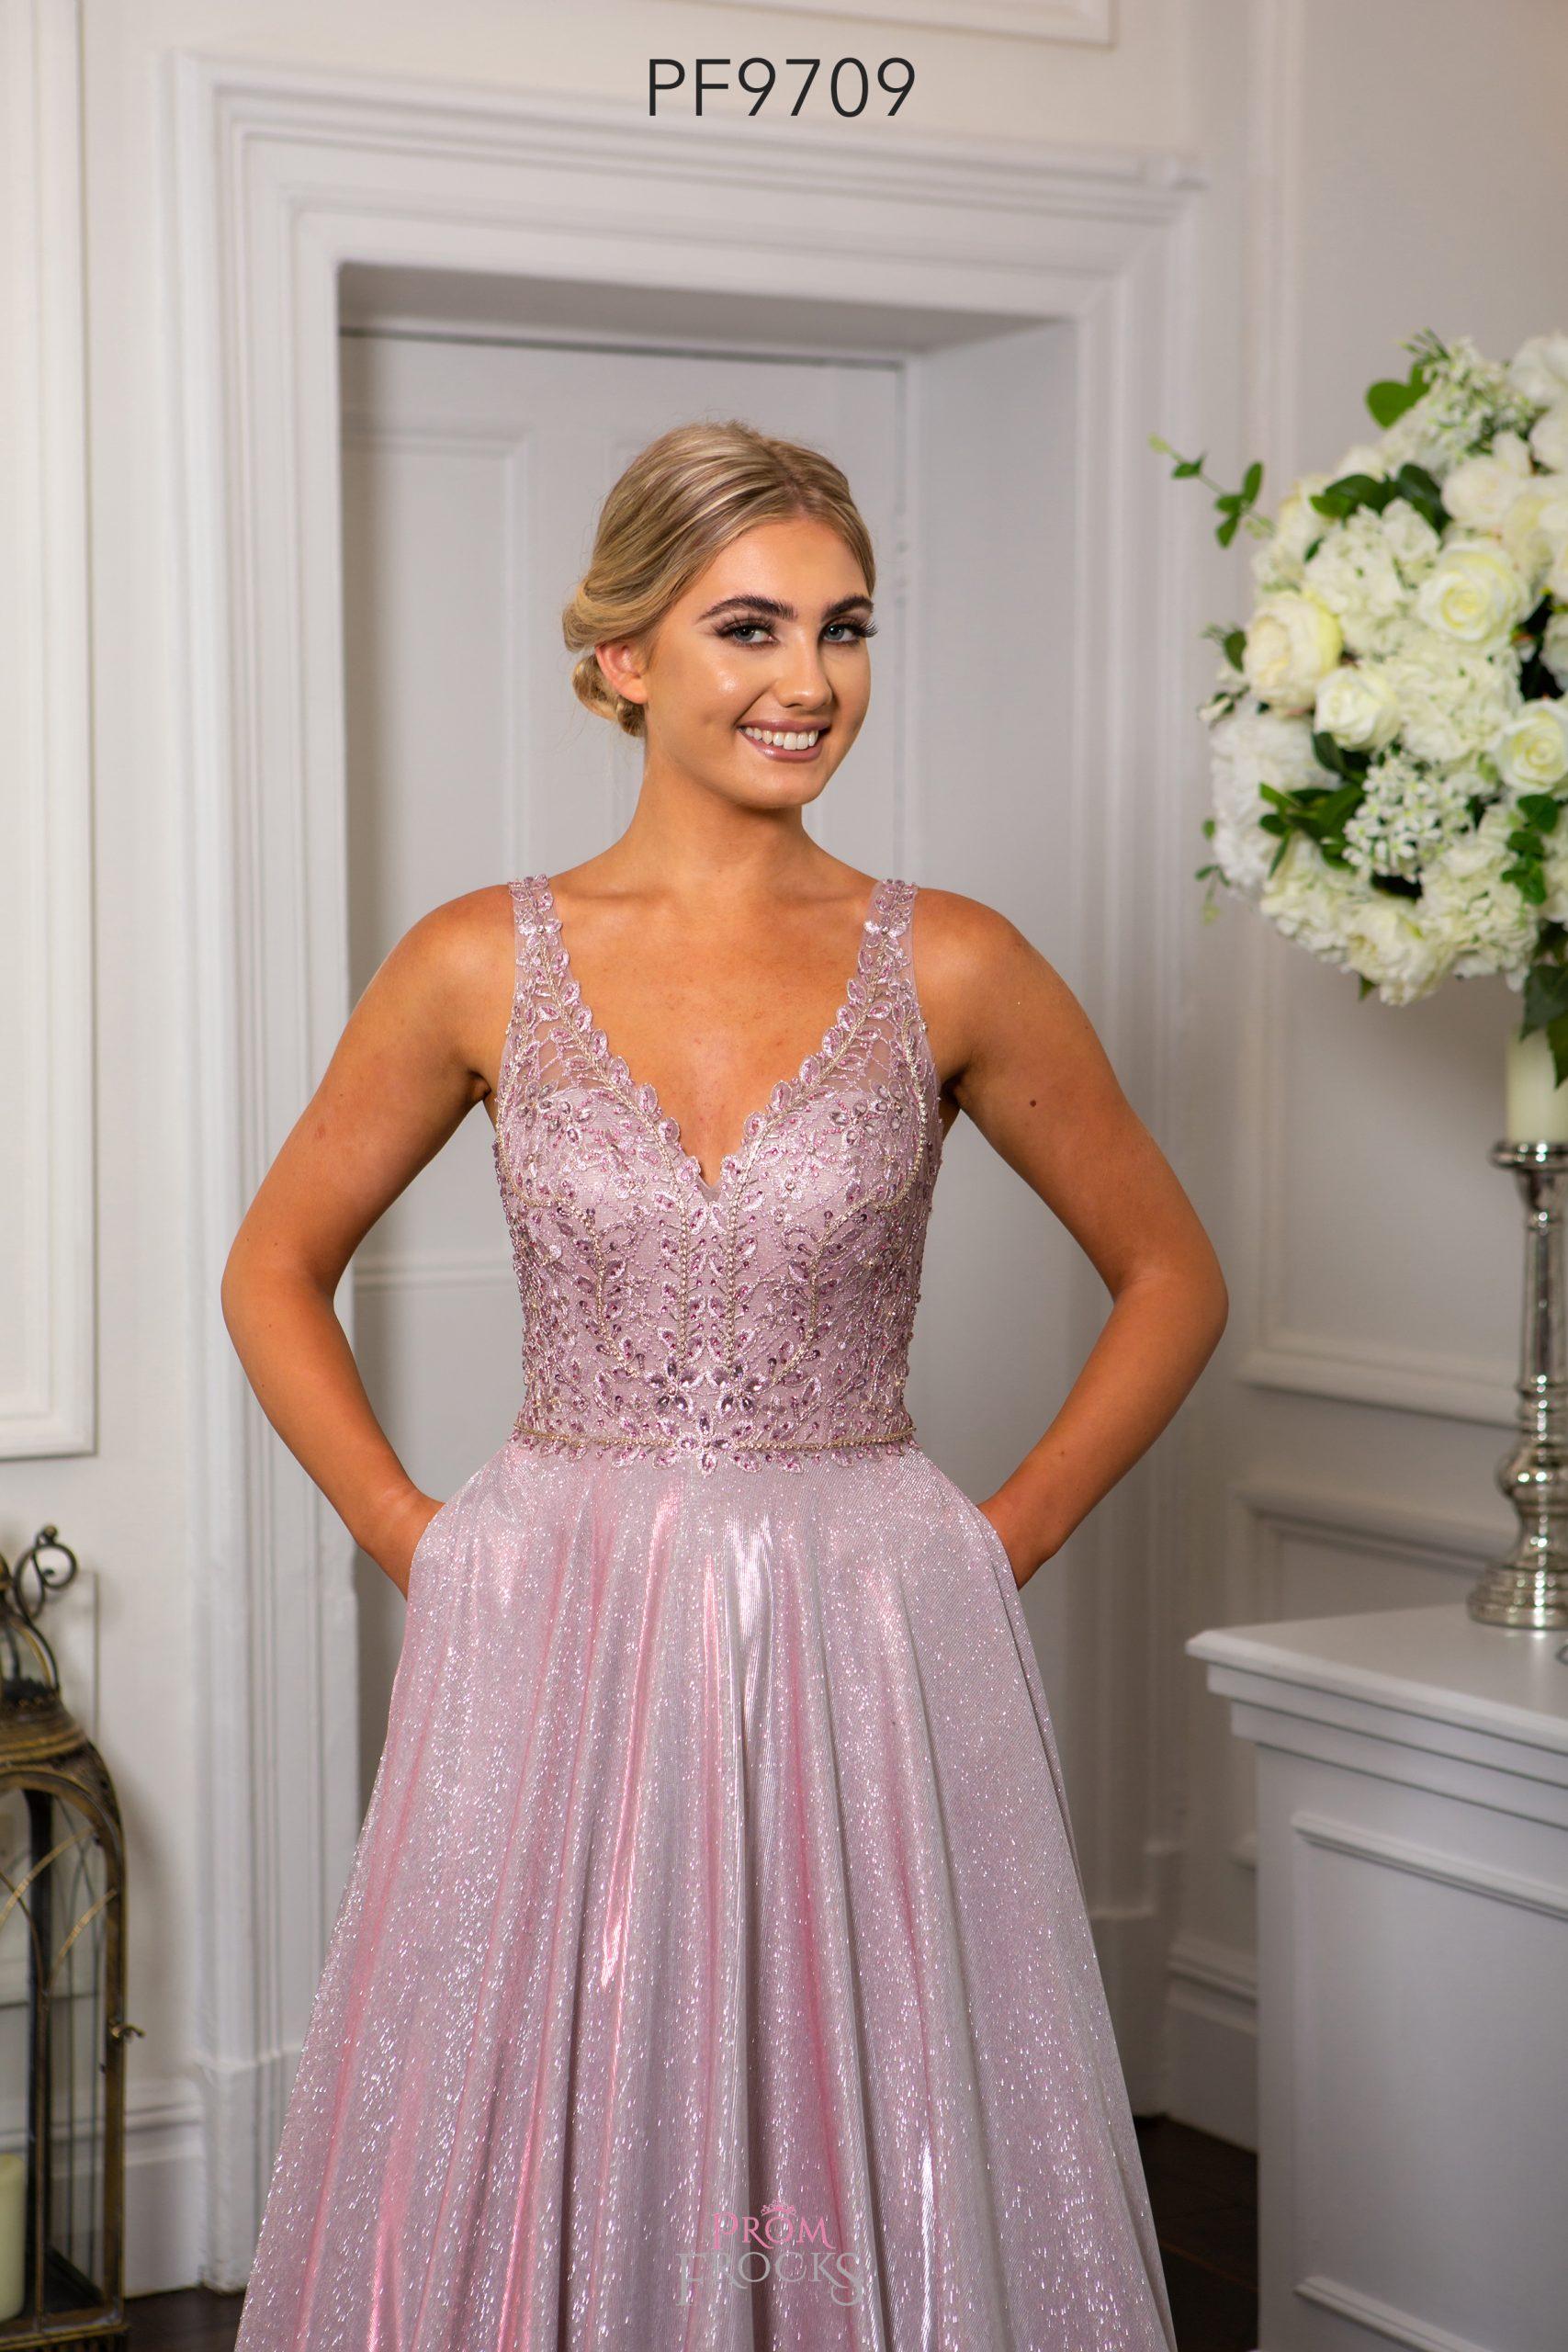 PF9752 ROSE BLACK PROM/EVENING DRESS - Prom Frocks UK Prom